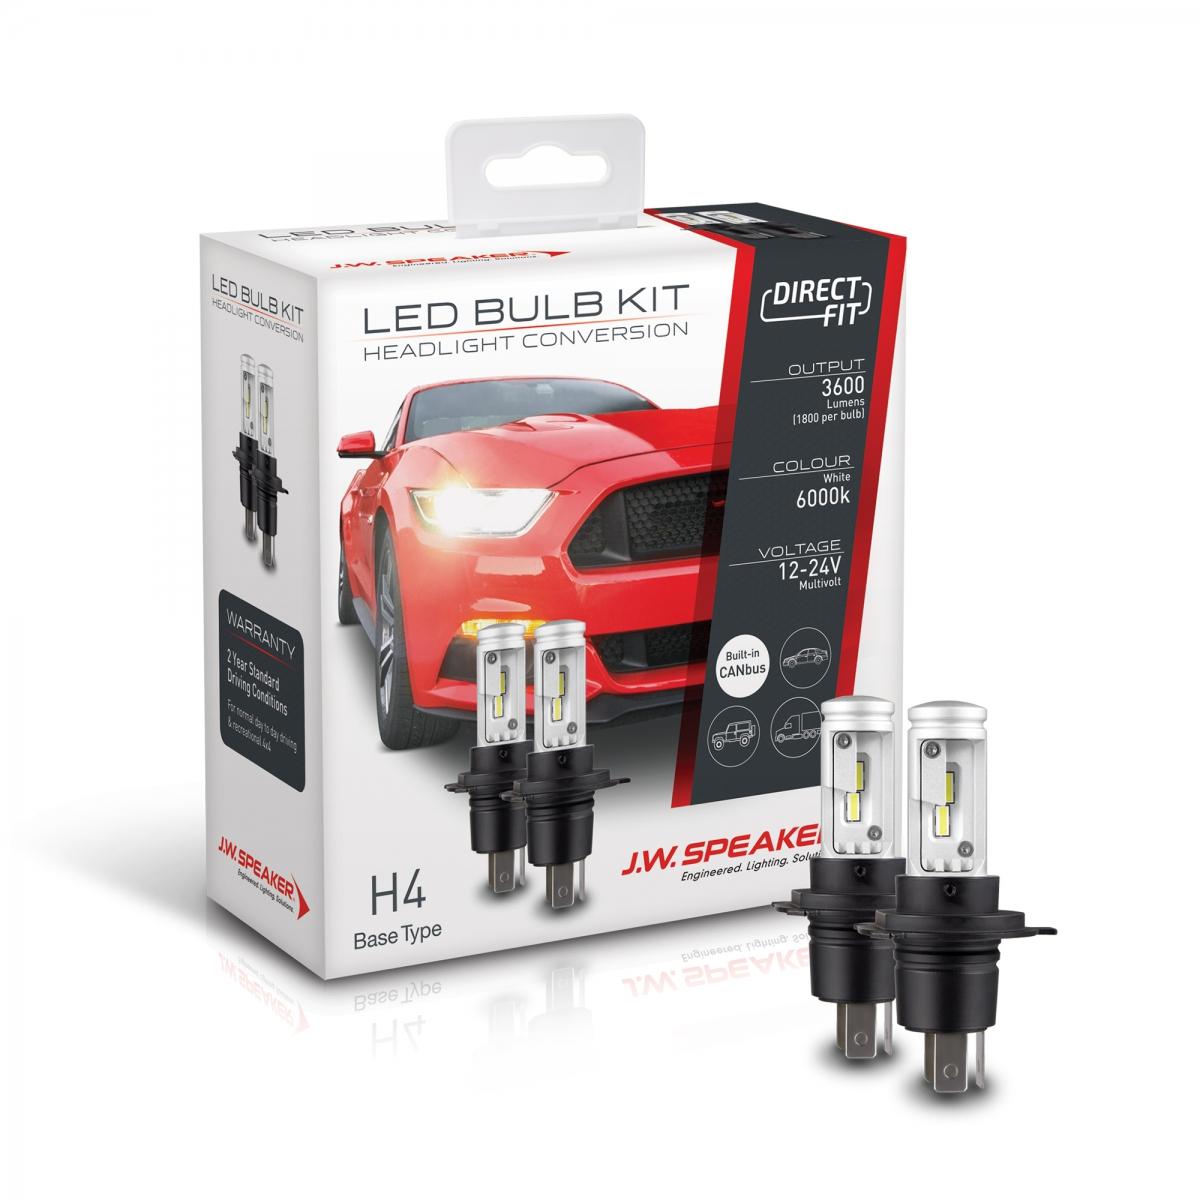 LED Headlight Conversion Kit – Direct Fit